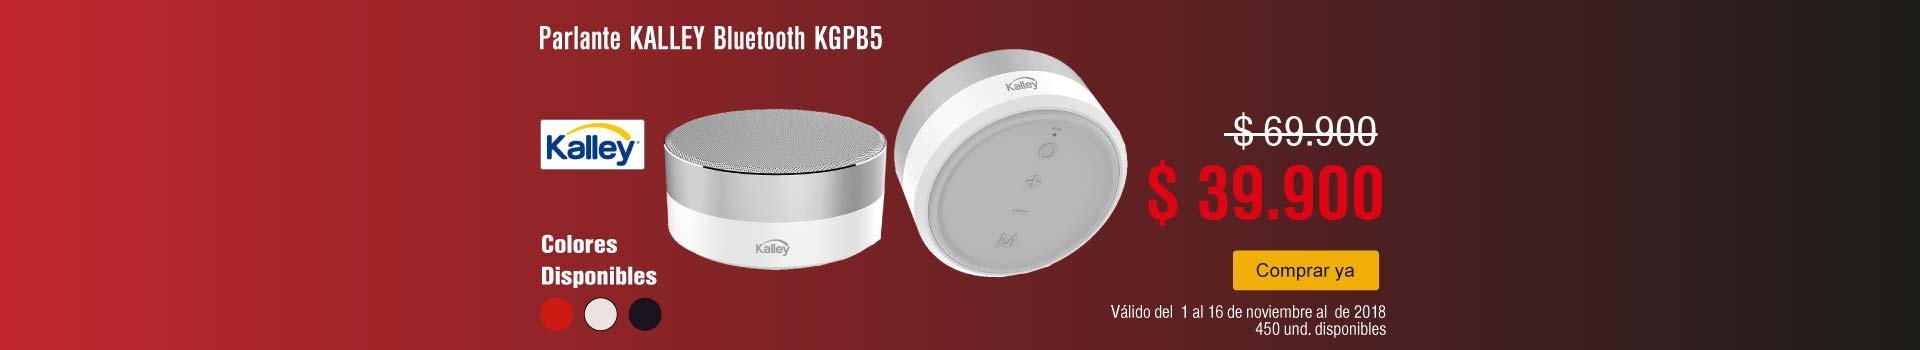 AK-KT-BCAT-11-accesorios-PP---parlante-kalley-14nov